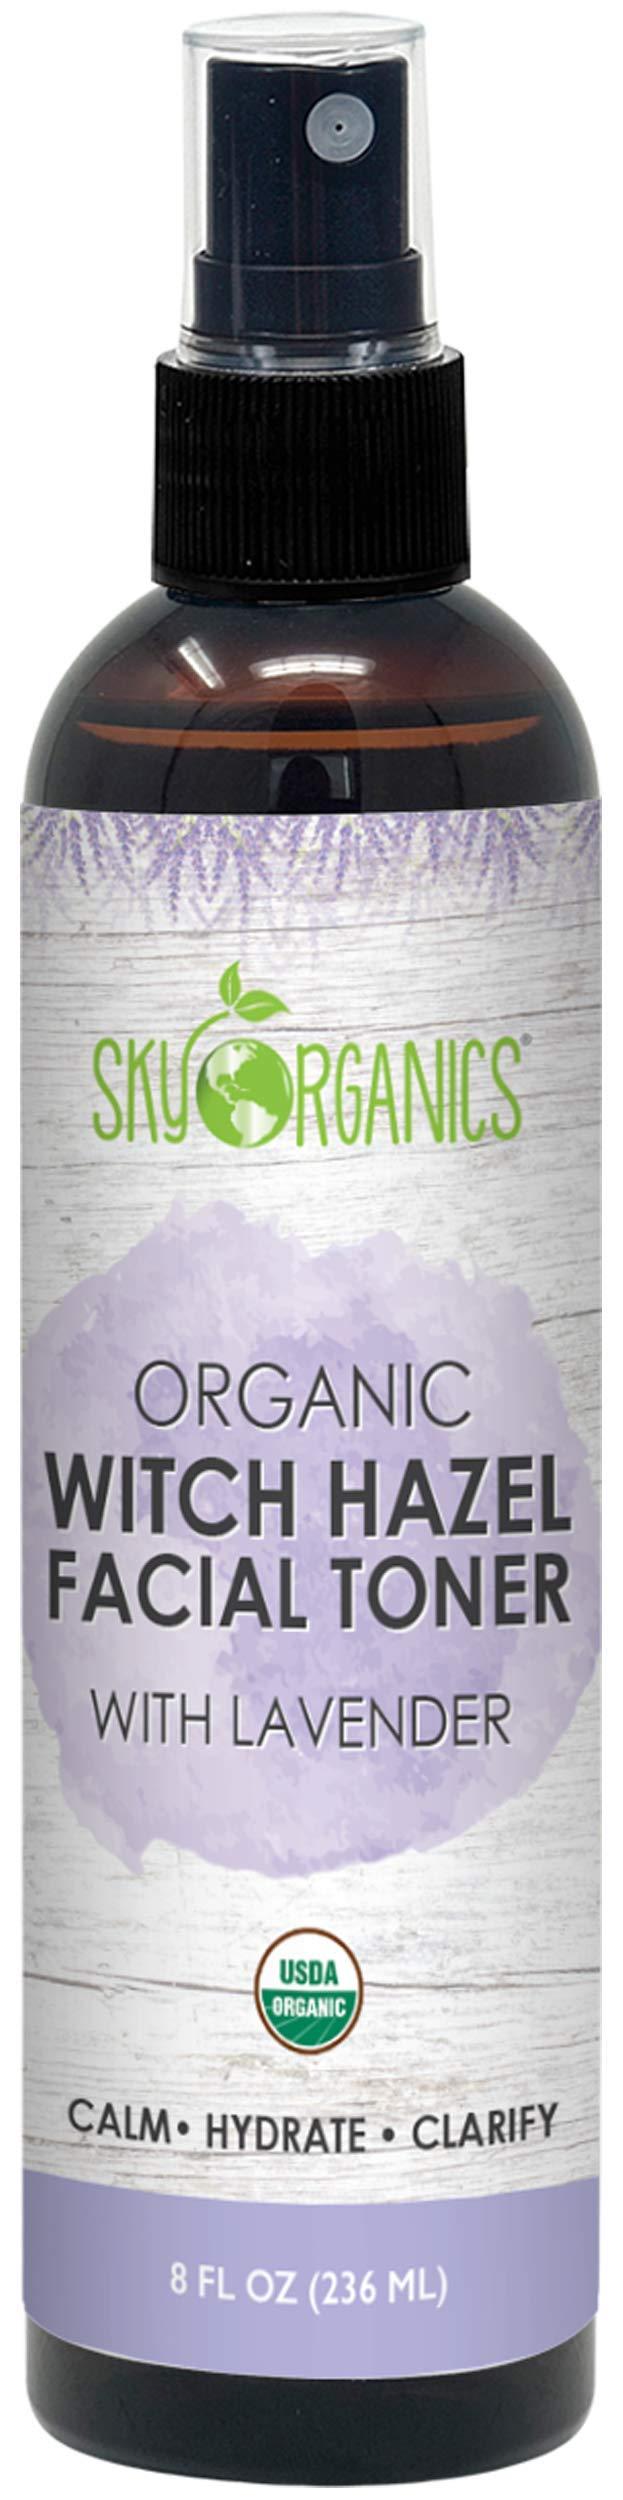 Organic Lavender Witch Hazel Toner I 8 oz I Soothing Lavender Toner, Witch Hazel Face Mist with Lavender, For Sensitive and Combination Skin, Cruelty-Free and Vegan Facial Toner (Lavender)